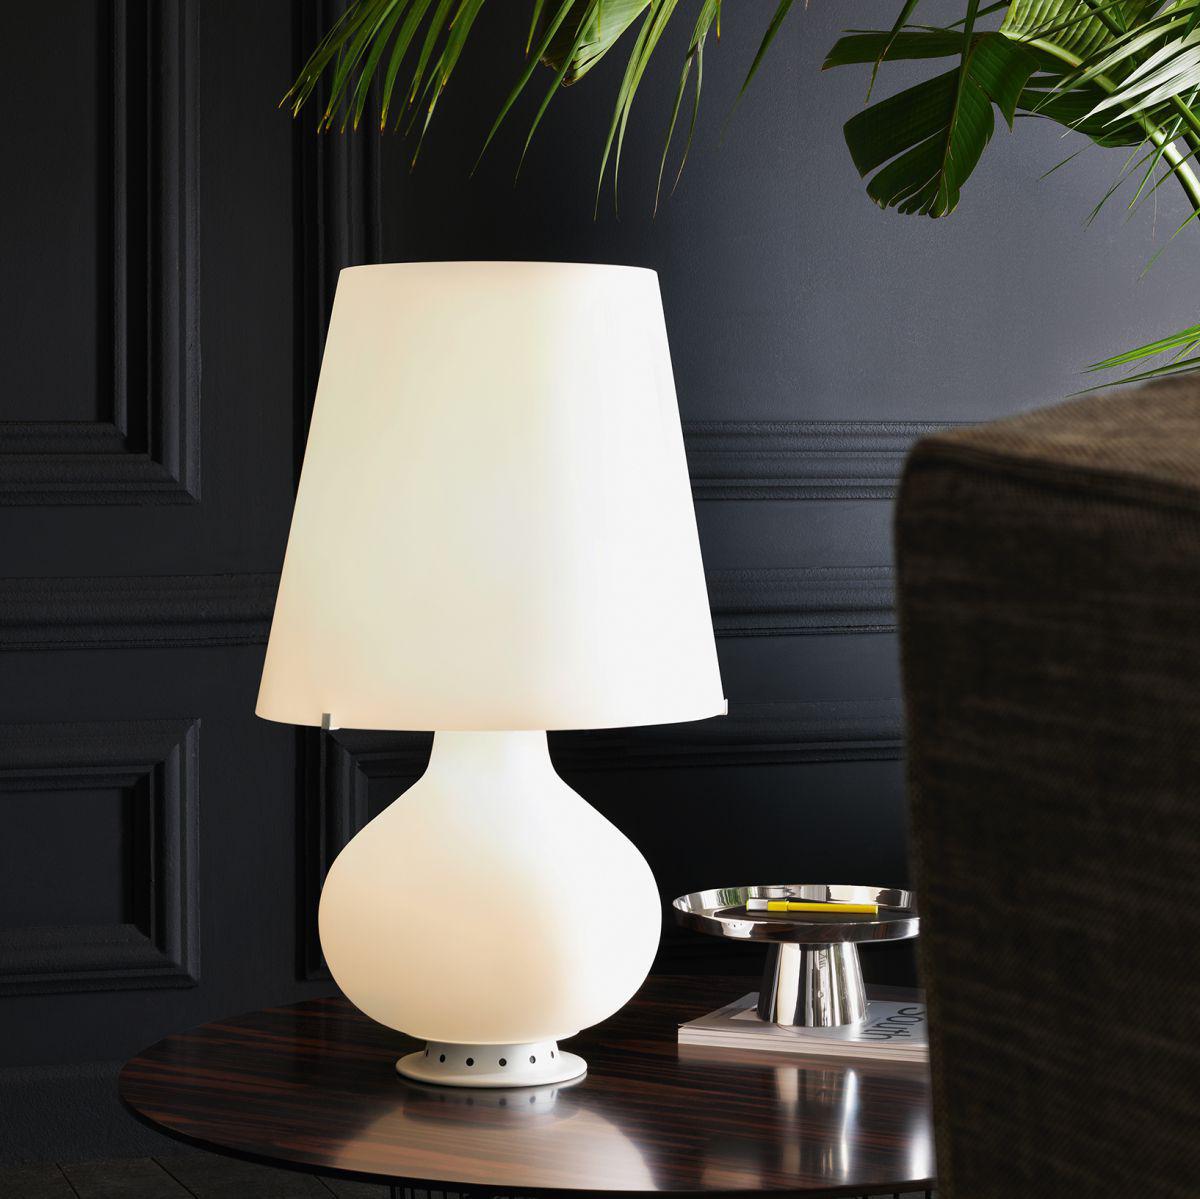 lampe de table fontana medium led h 53 cm h 53 blanc fontana arte. Black Bedroom Furniture Sets. Home Design Ideas